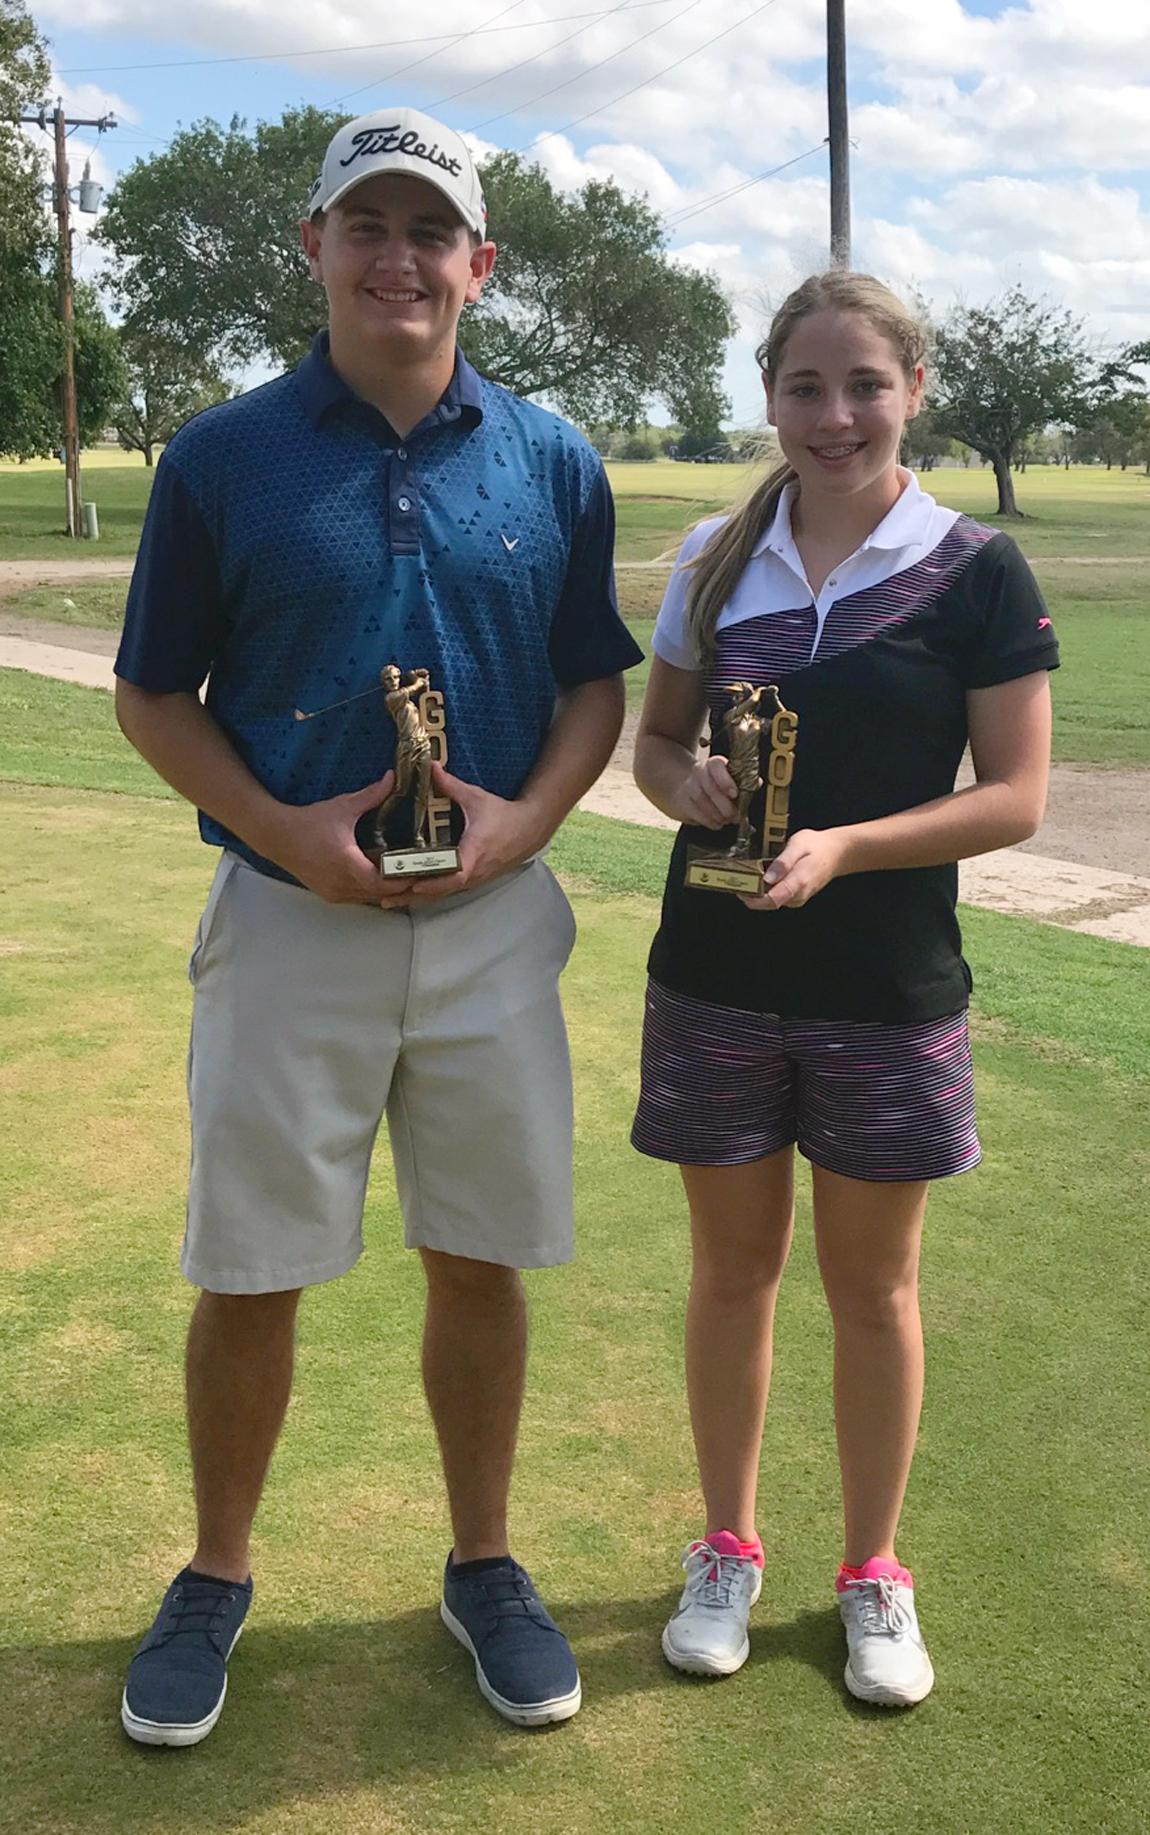 Busby-Wofford, Champion win Hondo Junior Golf Classic